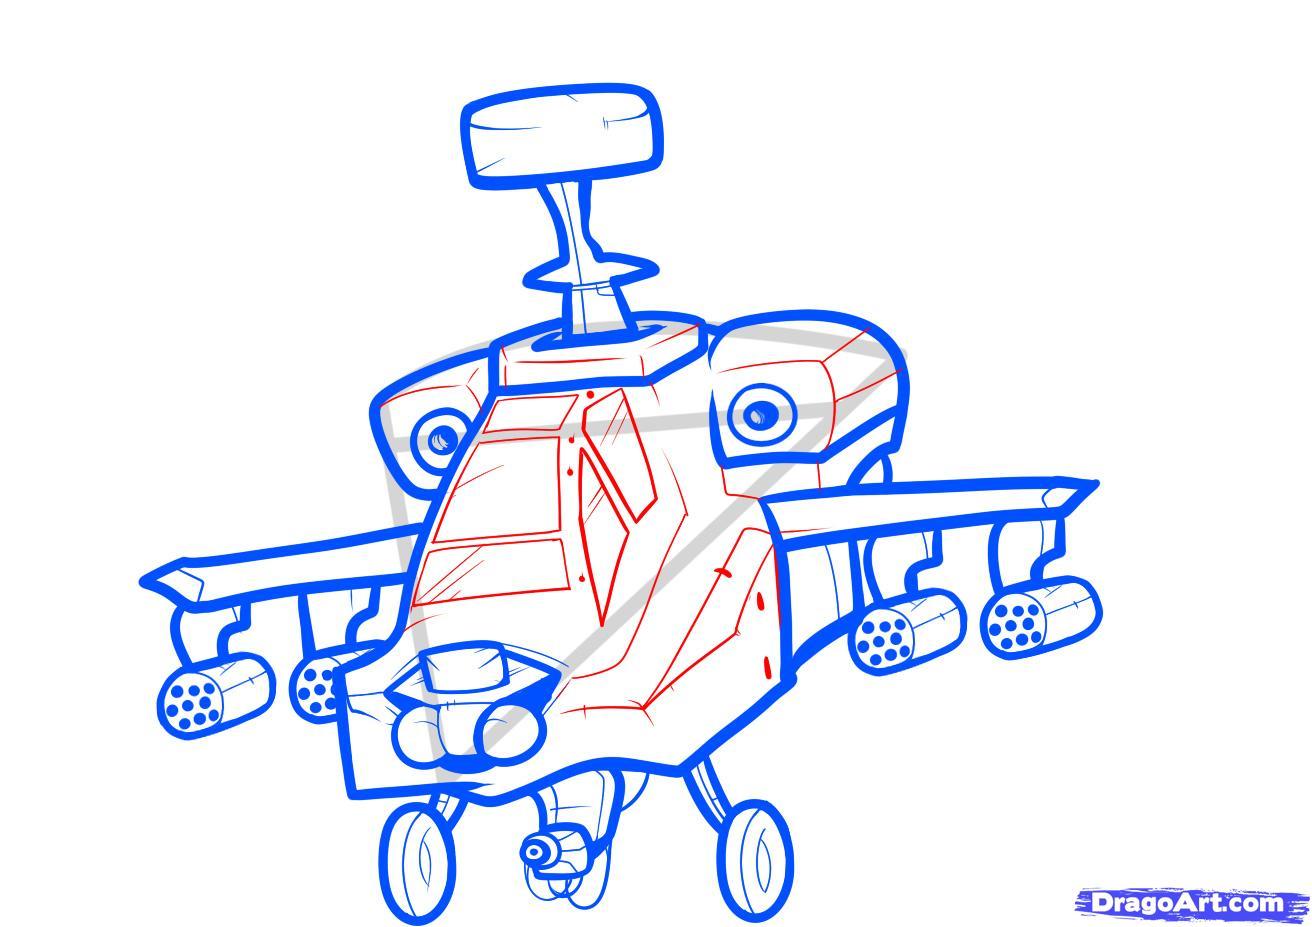 Рисуем вертолет AH-64 Apache - шаг 6